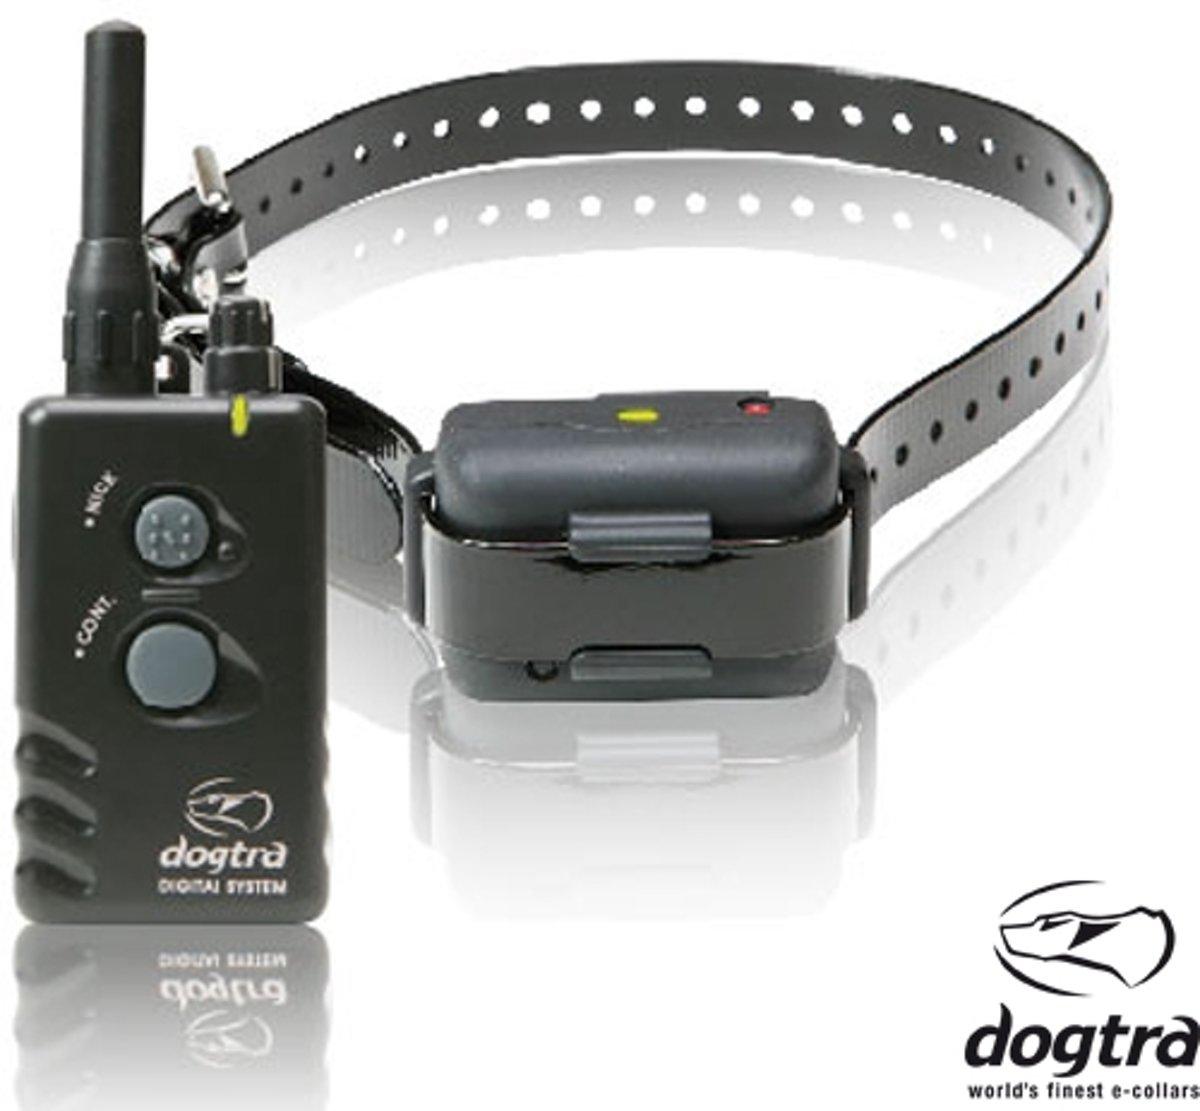 Dogtra trainingshalsband 400NCP kopen